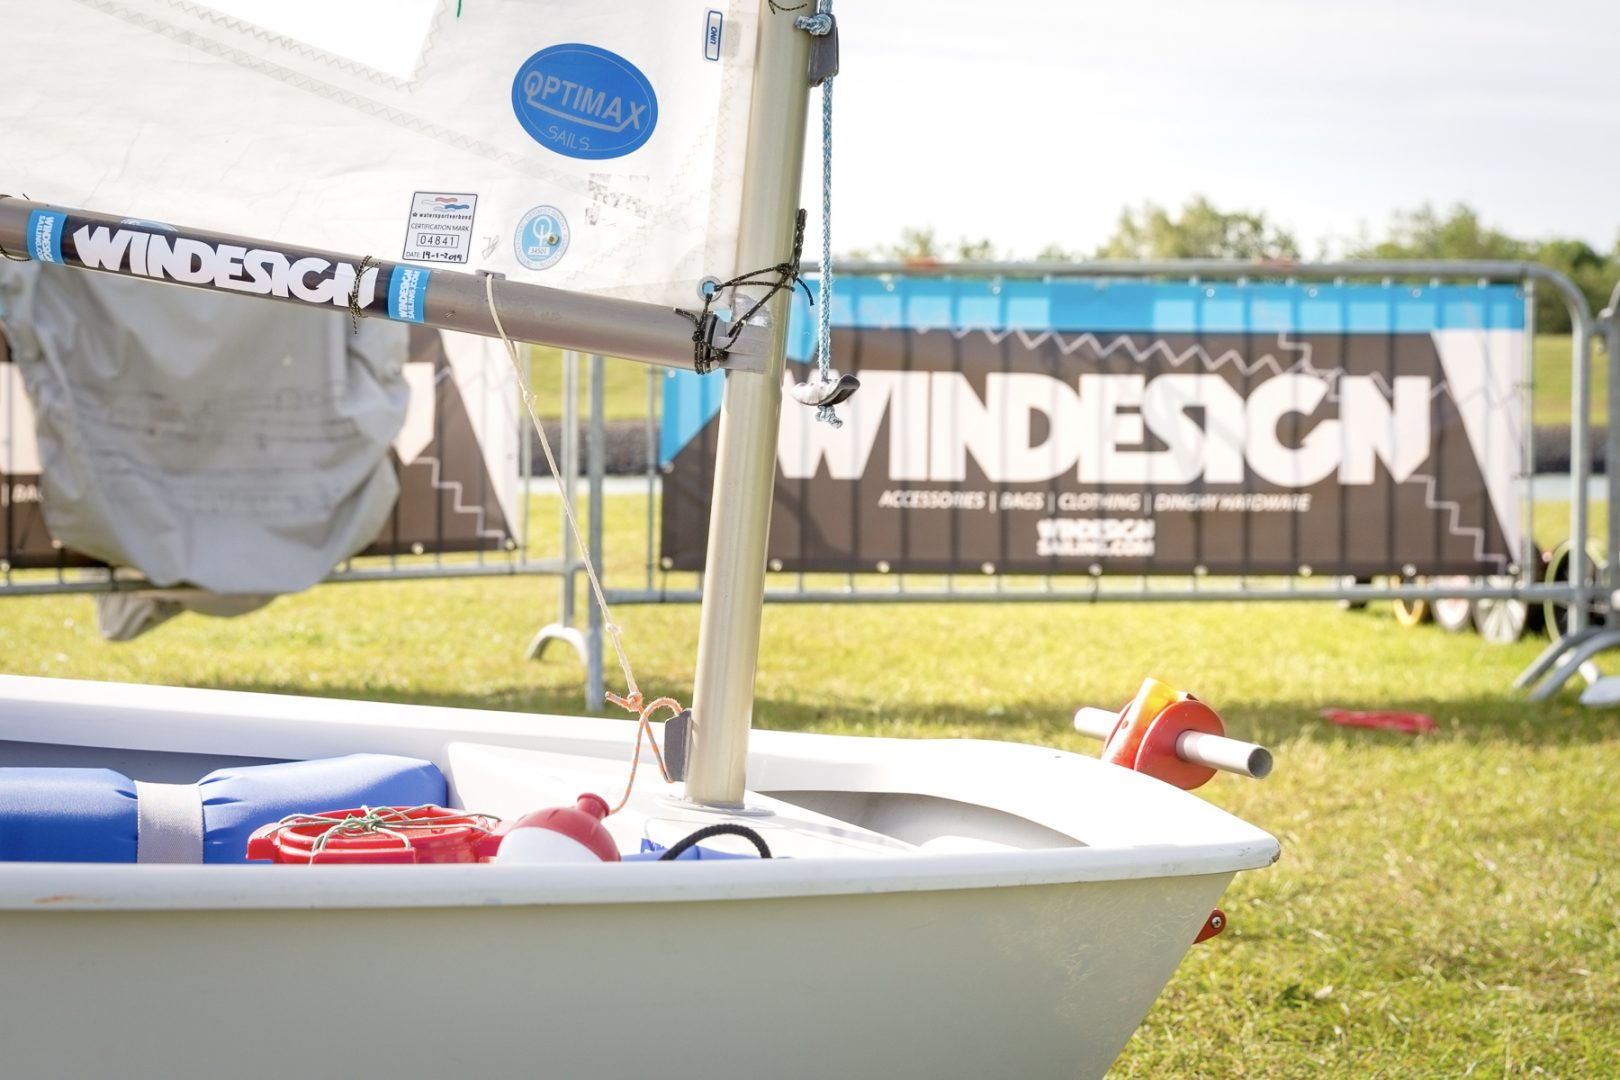 Less plastic Windesign and Dutch Youth Regatta